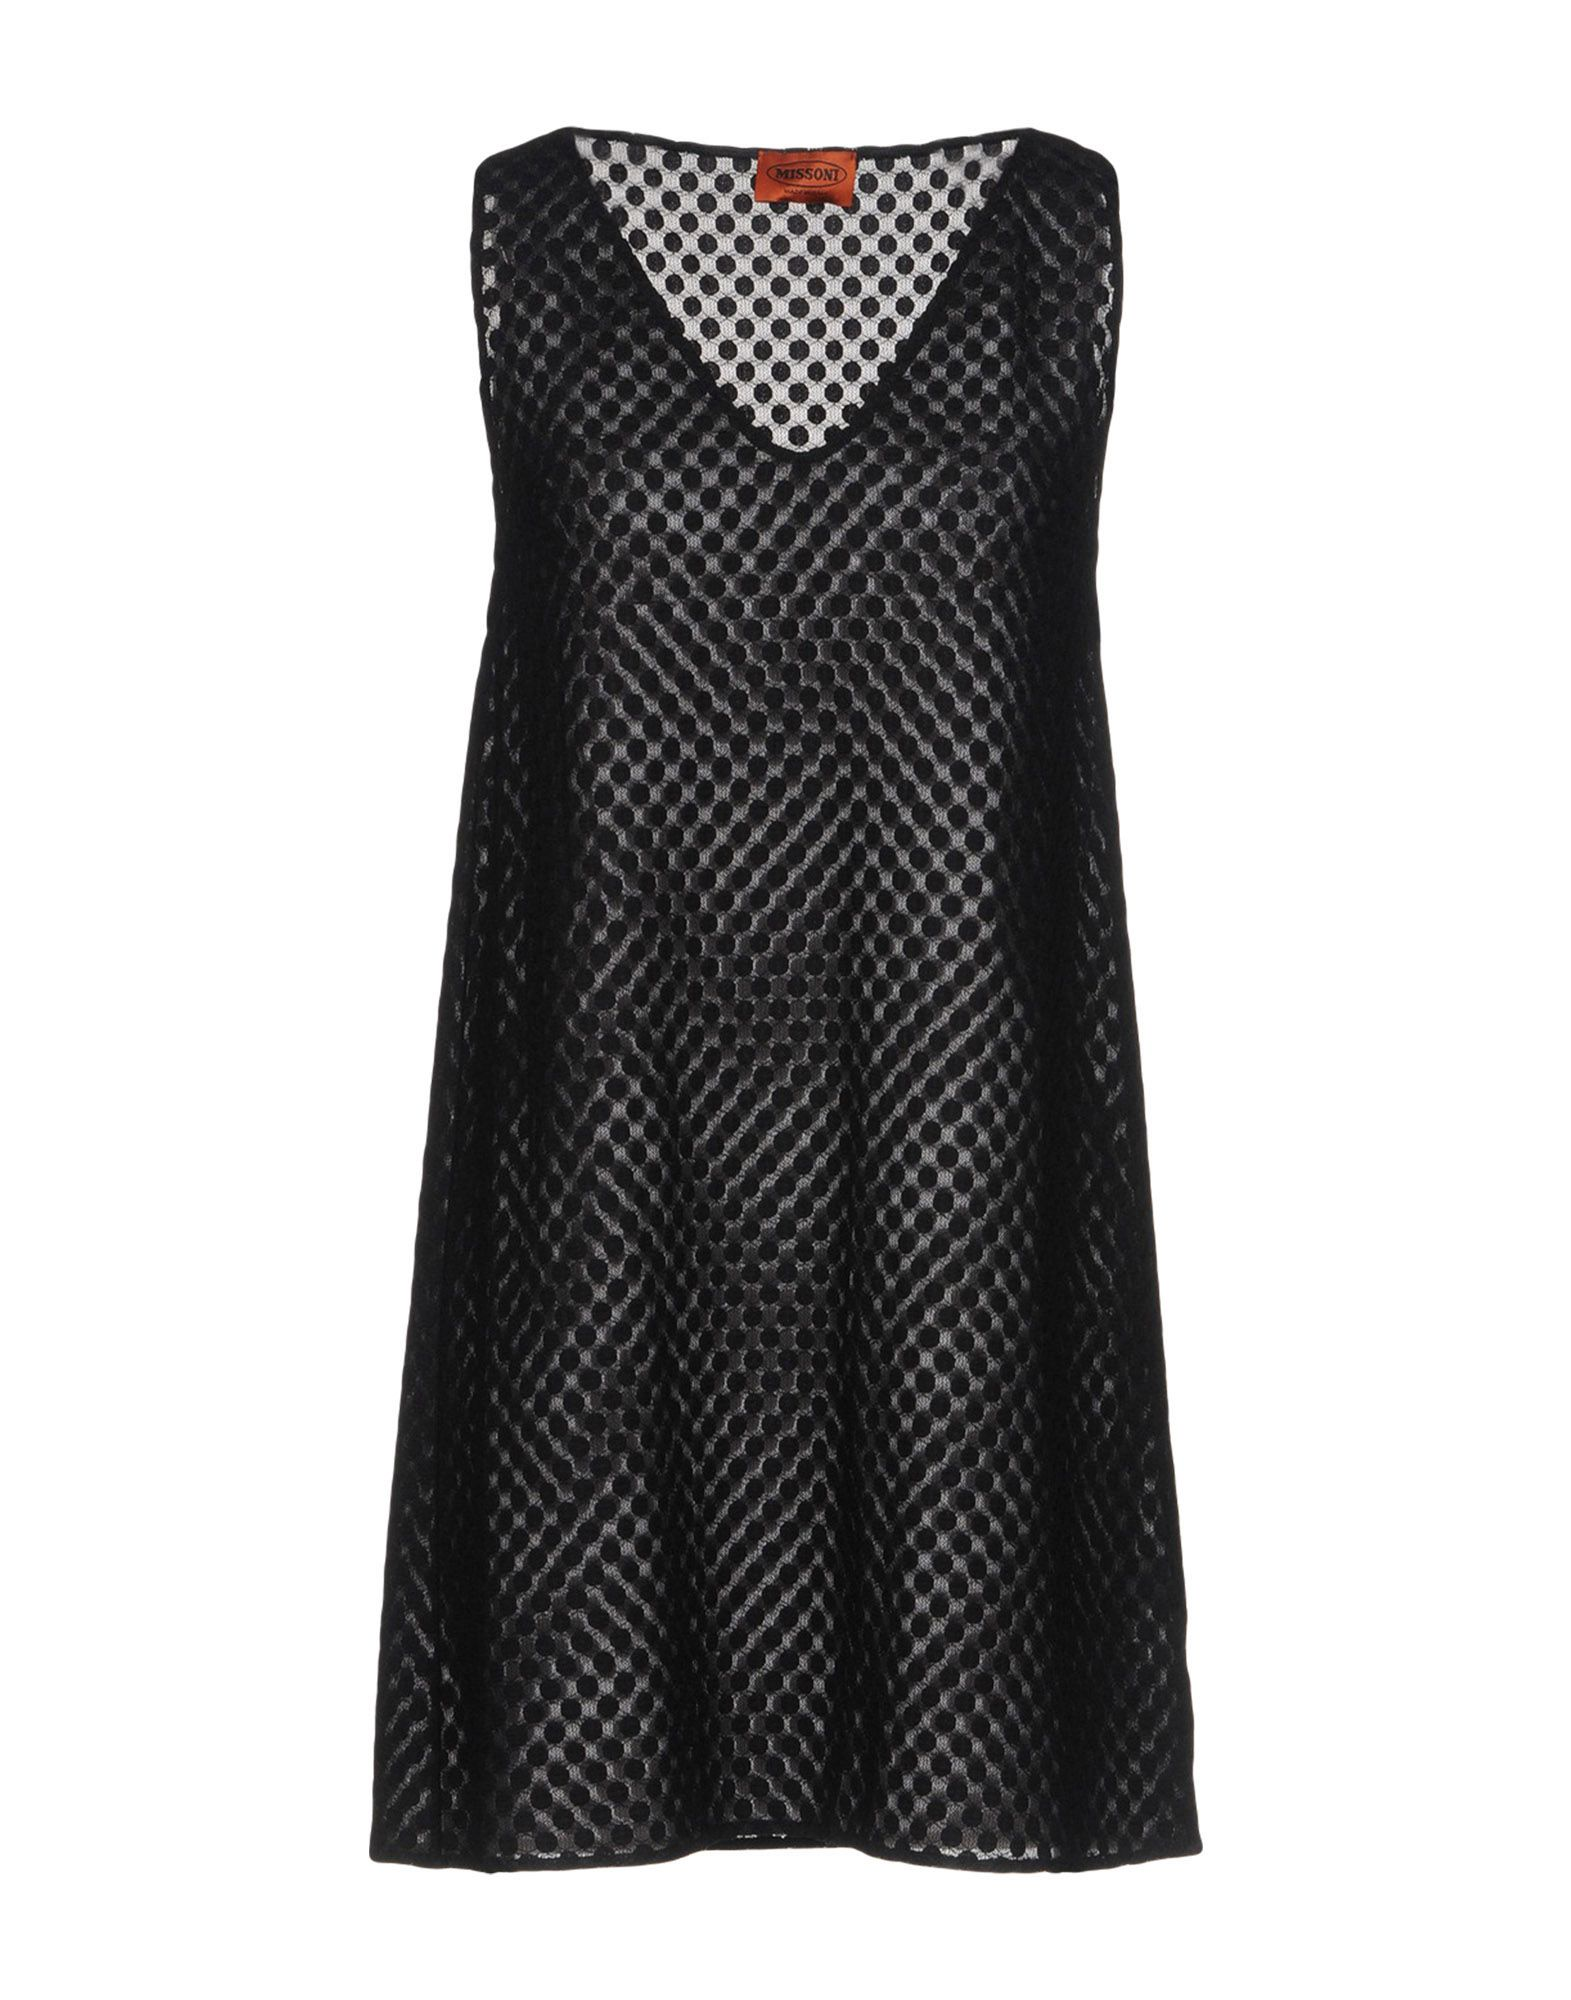 Missoni Sale - Dresses Missoni - Missoni Women - YOOX United States